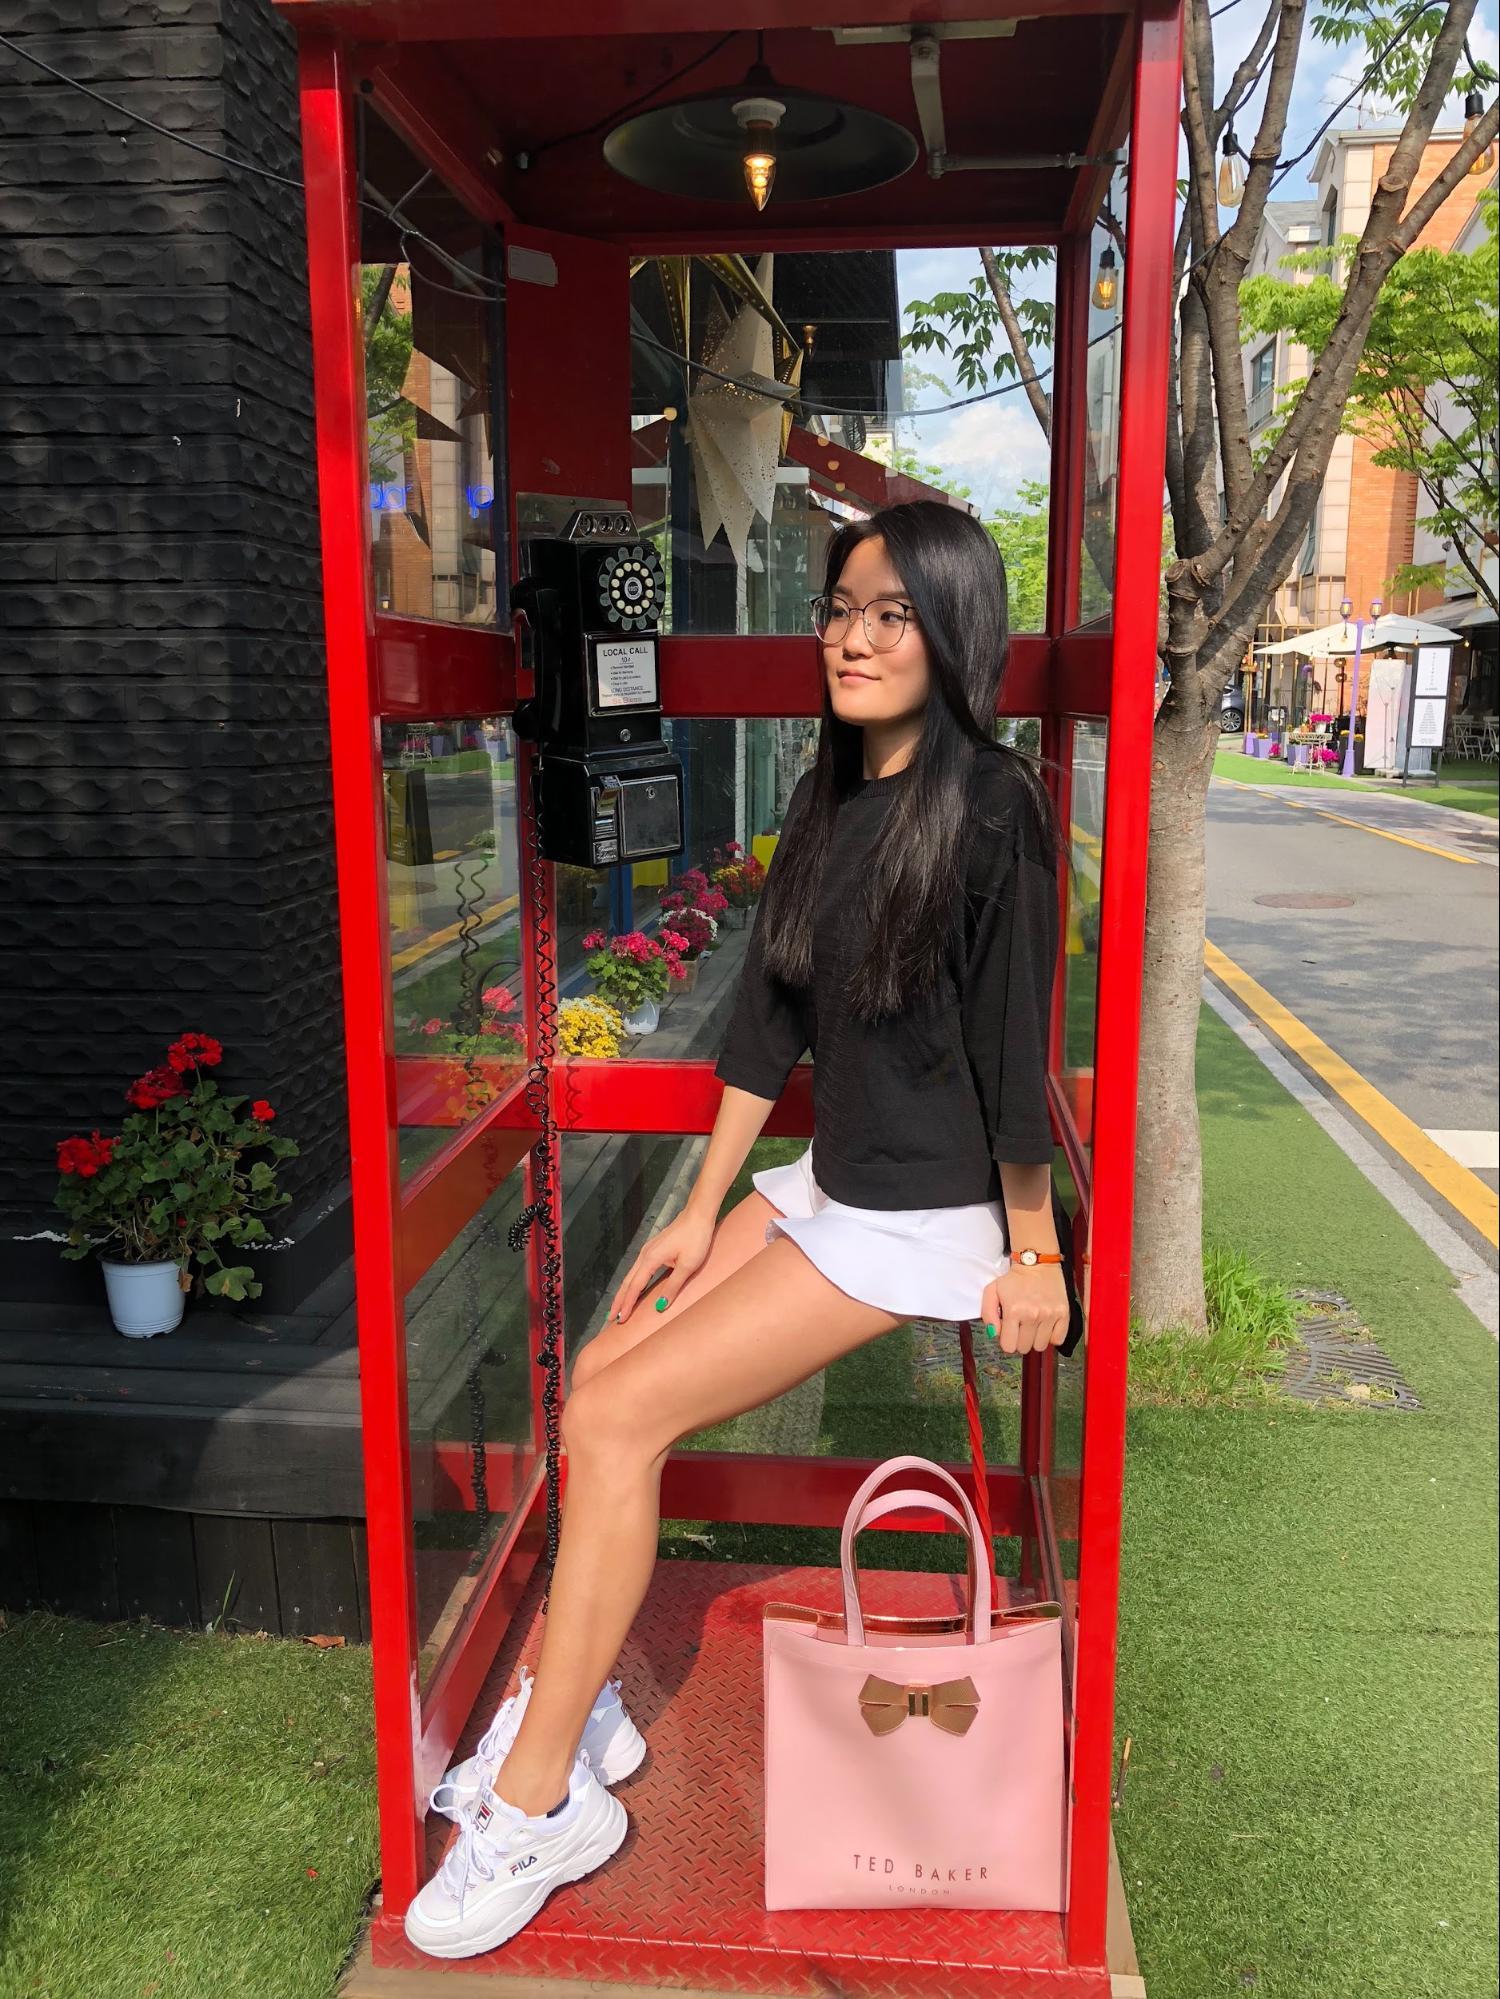 korea influences western korean fashion clothes influences clothing abroad